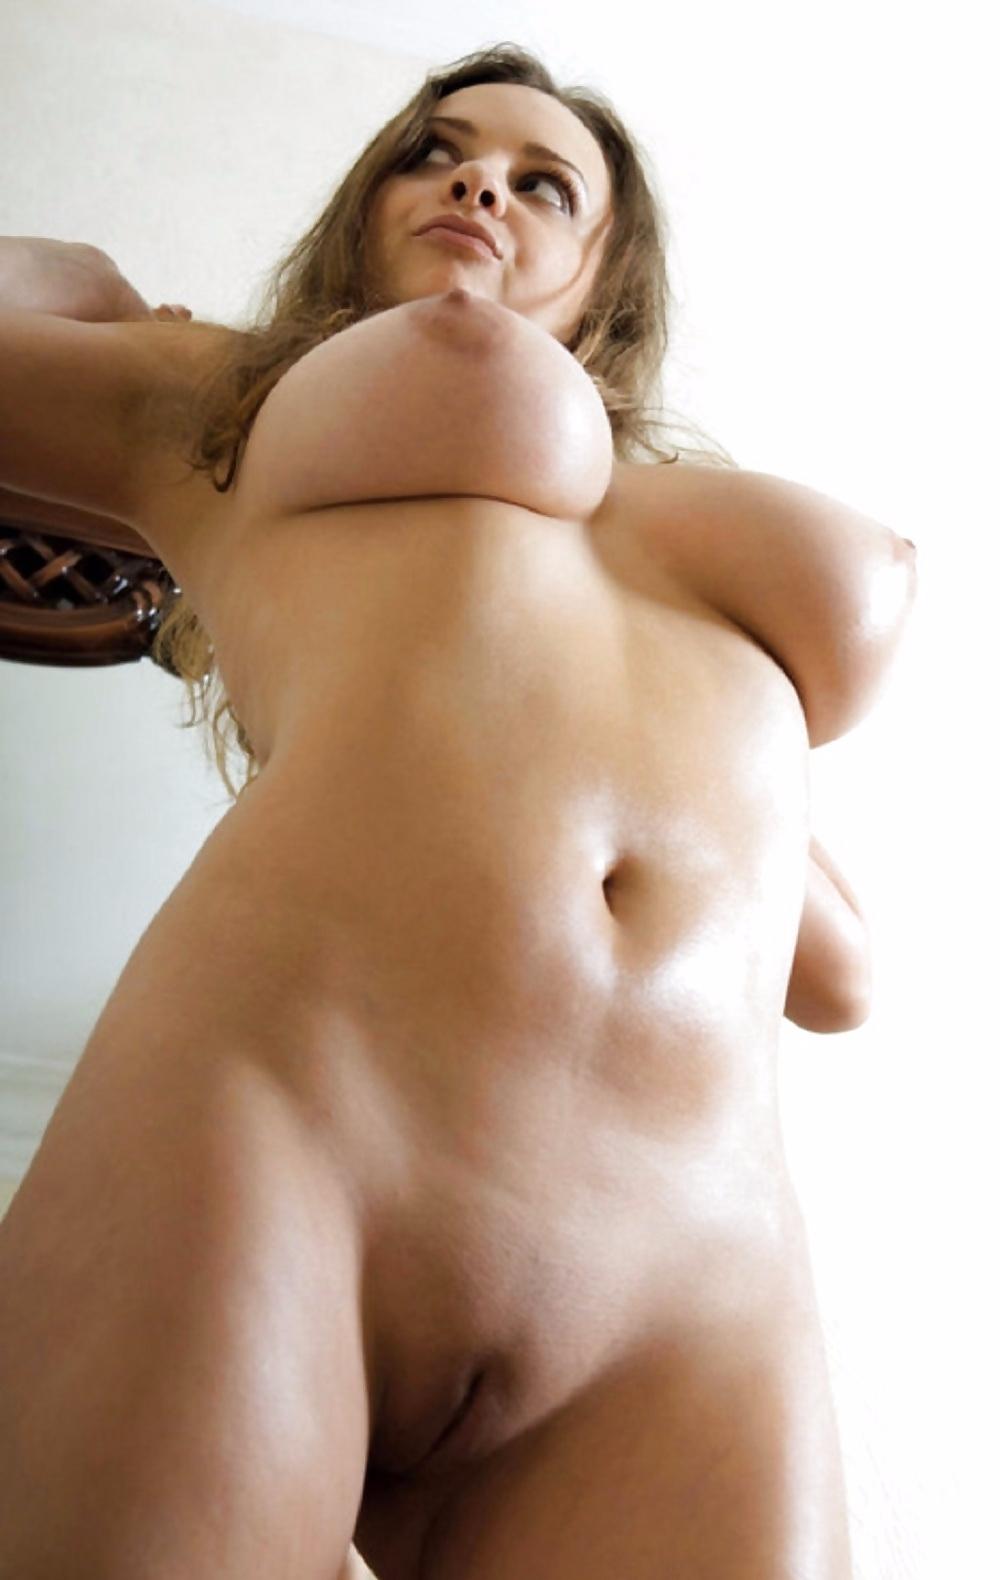 Фото прекрасная телка показала гладкую киску фото 671-715